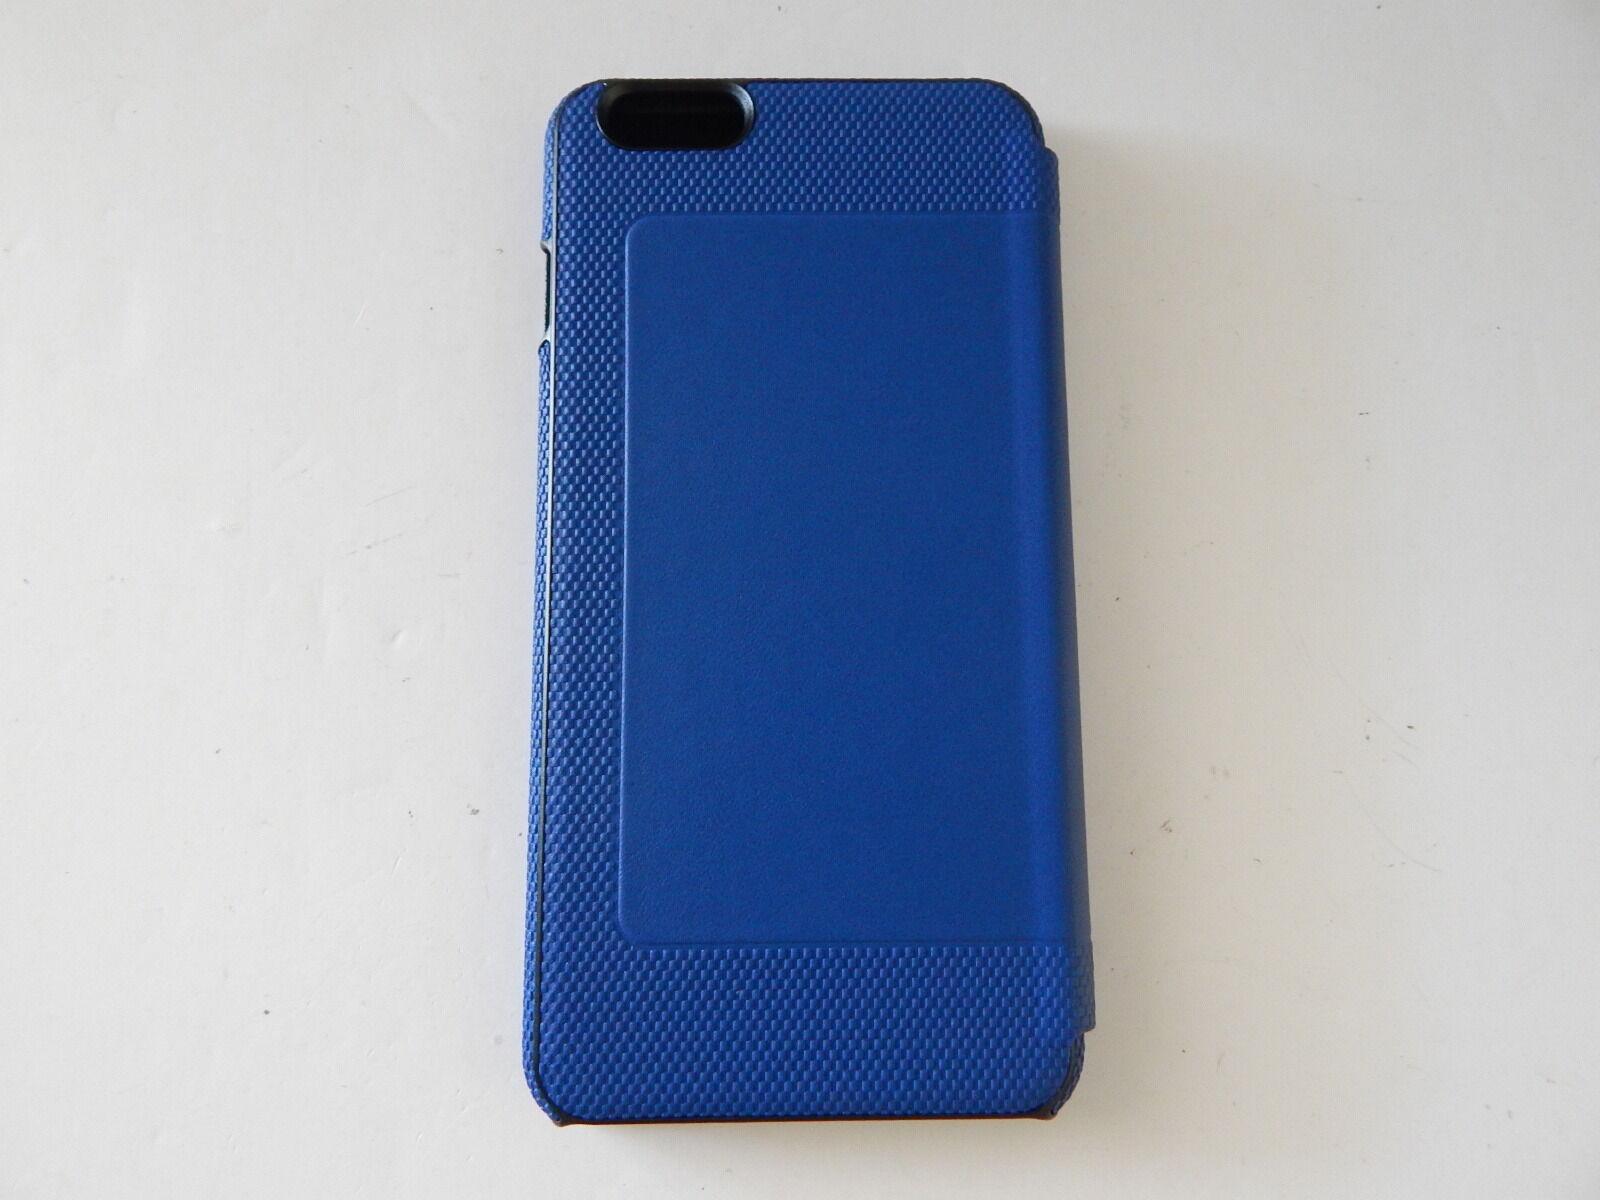 official photos 6b773 ccd53 Tumi Leather Folio Case Blue iPhone 6s 6 Plus